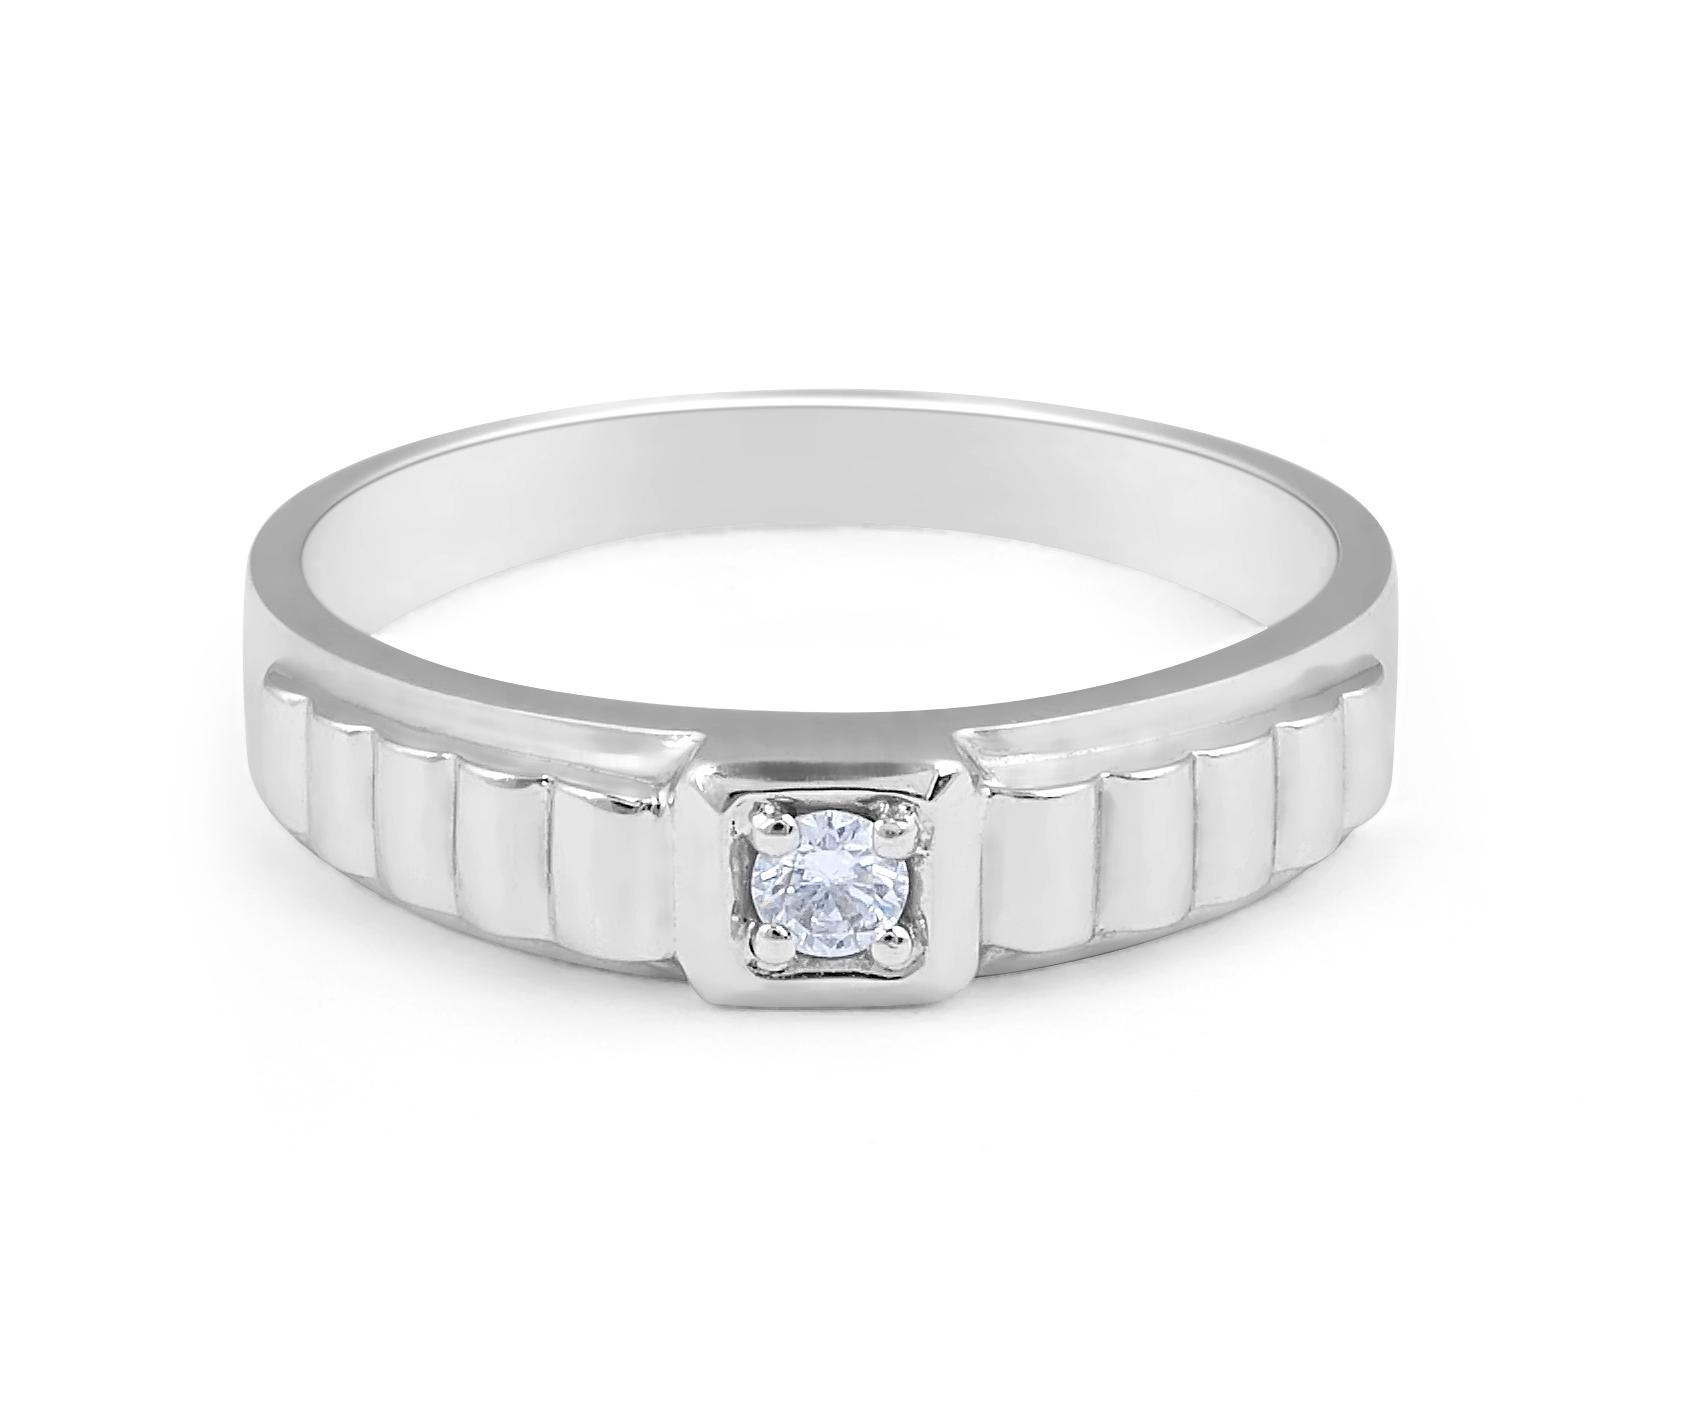 18 Karat White Gold solitaire, grid band, gents diamond wedding band